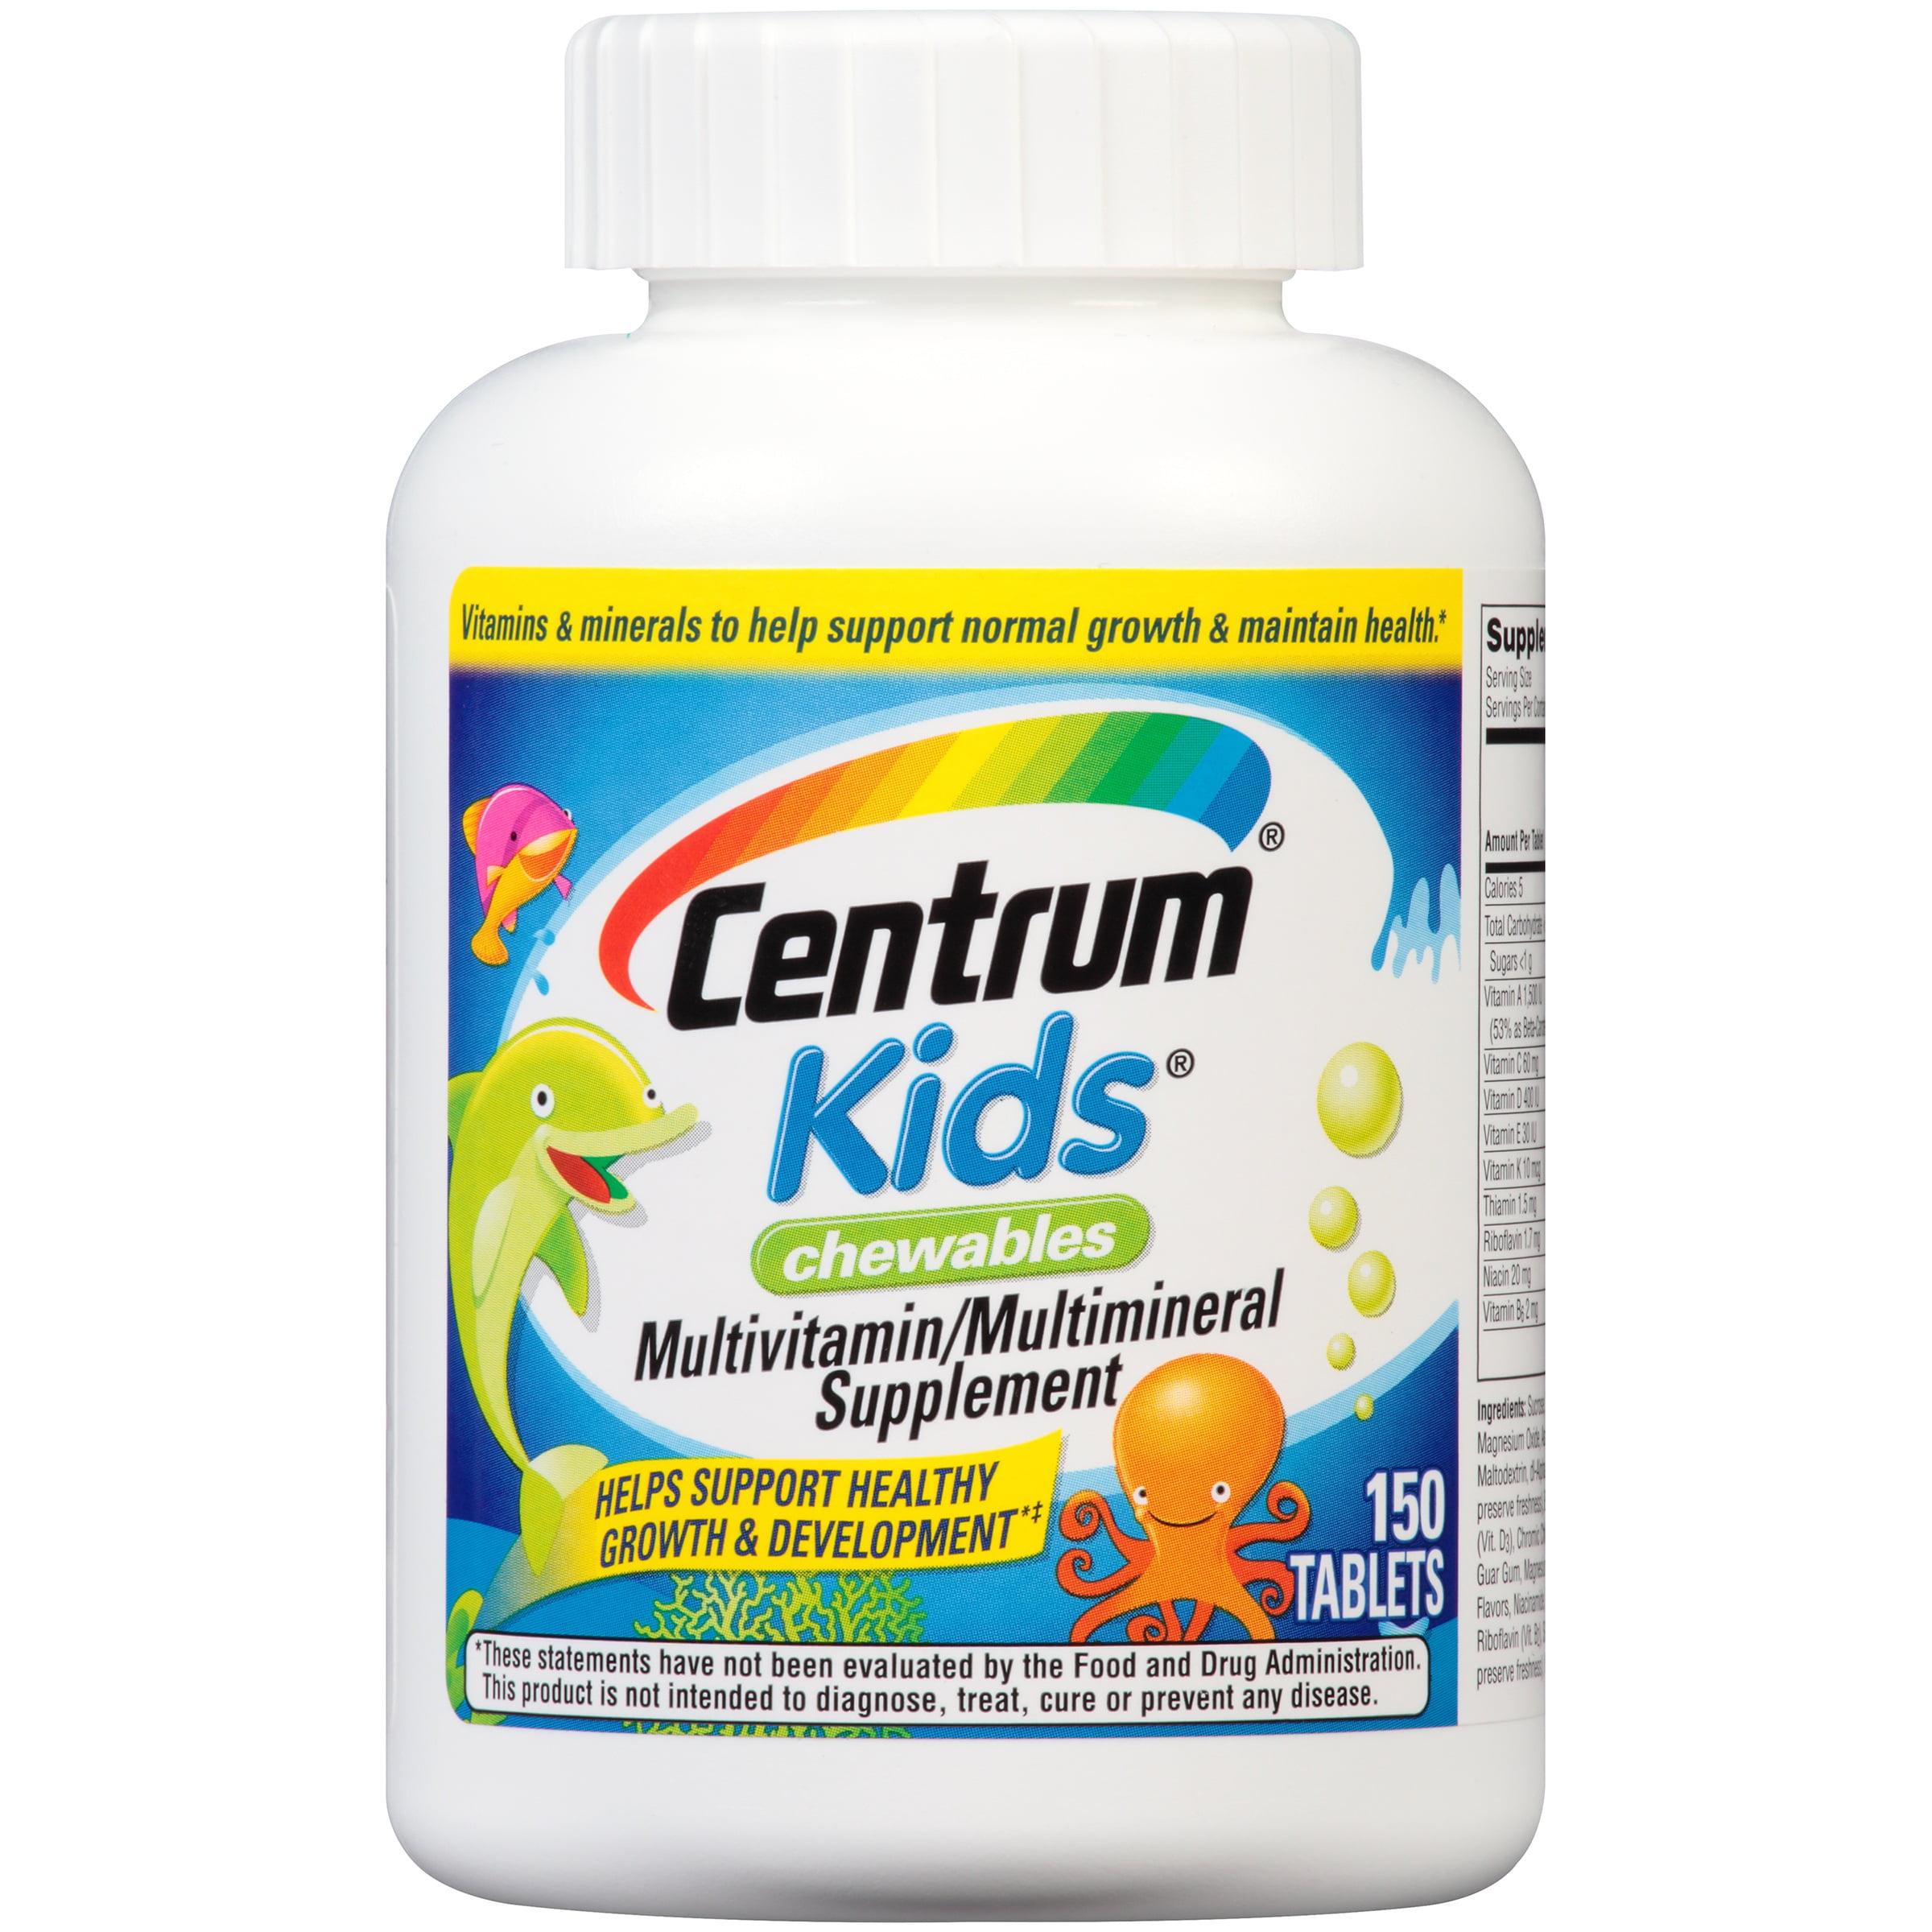 Centrum® Kids® Chewable Multivitamin/Multimineral Supplement 150 ct Bottle